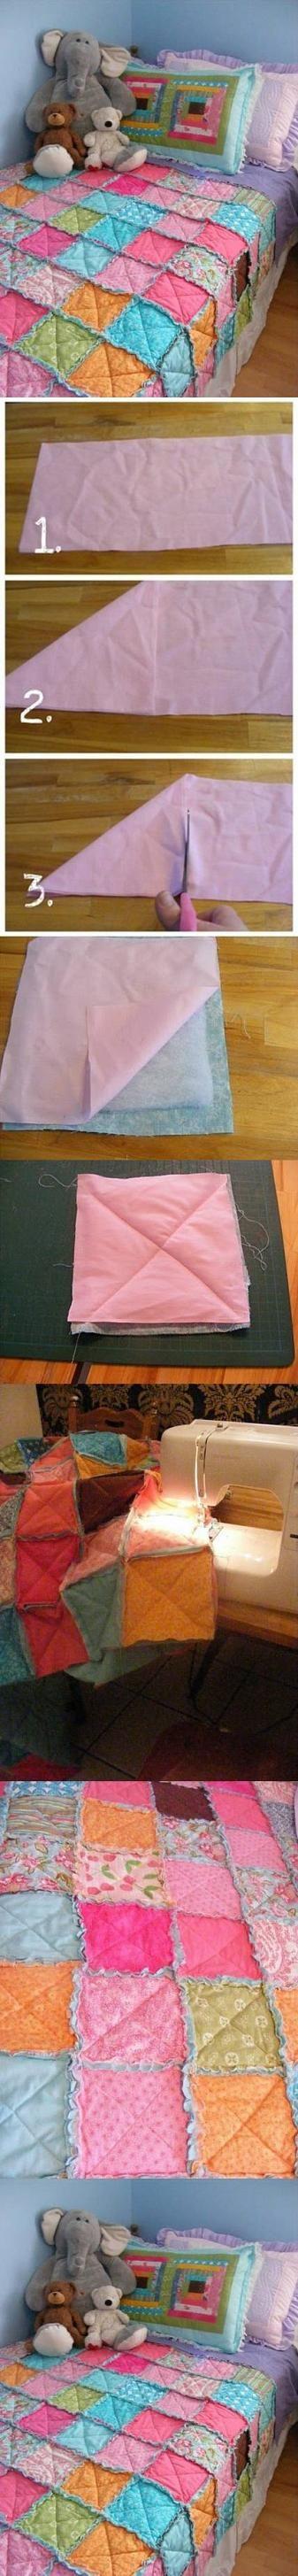 DIY Blanket Patchwork Technique Internet Tutorial | UsefulDIY.com